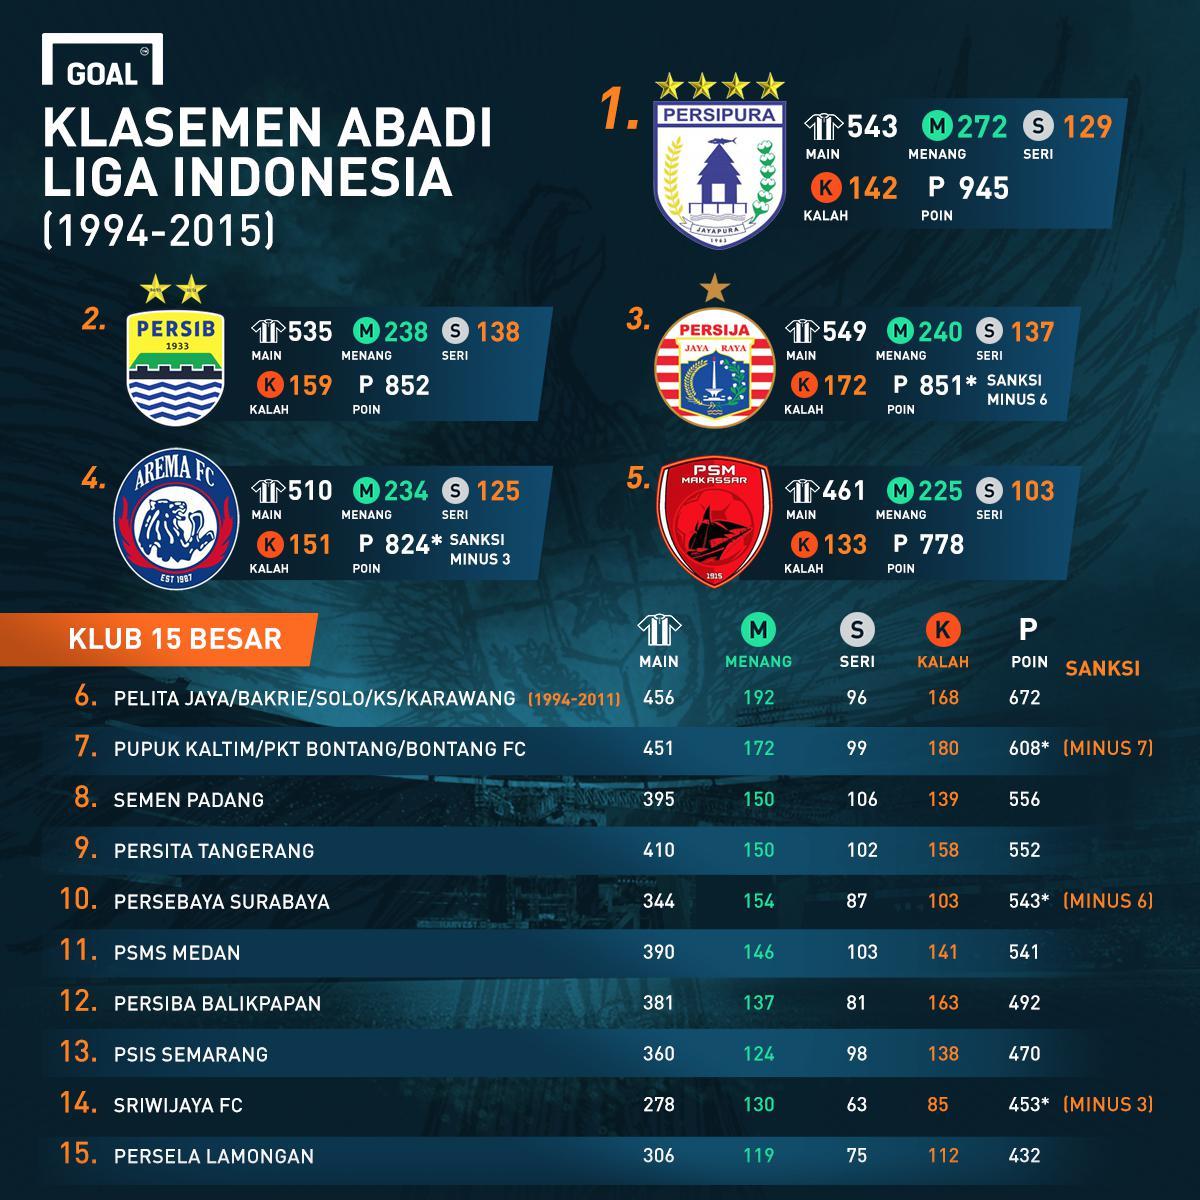 Gfxid Klasemen Abadi Liga Indonesia Revisi